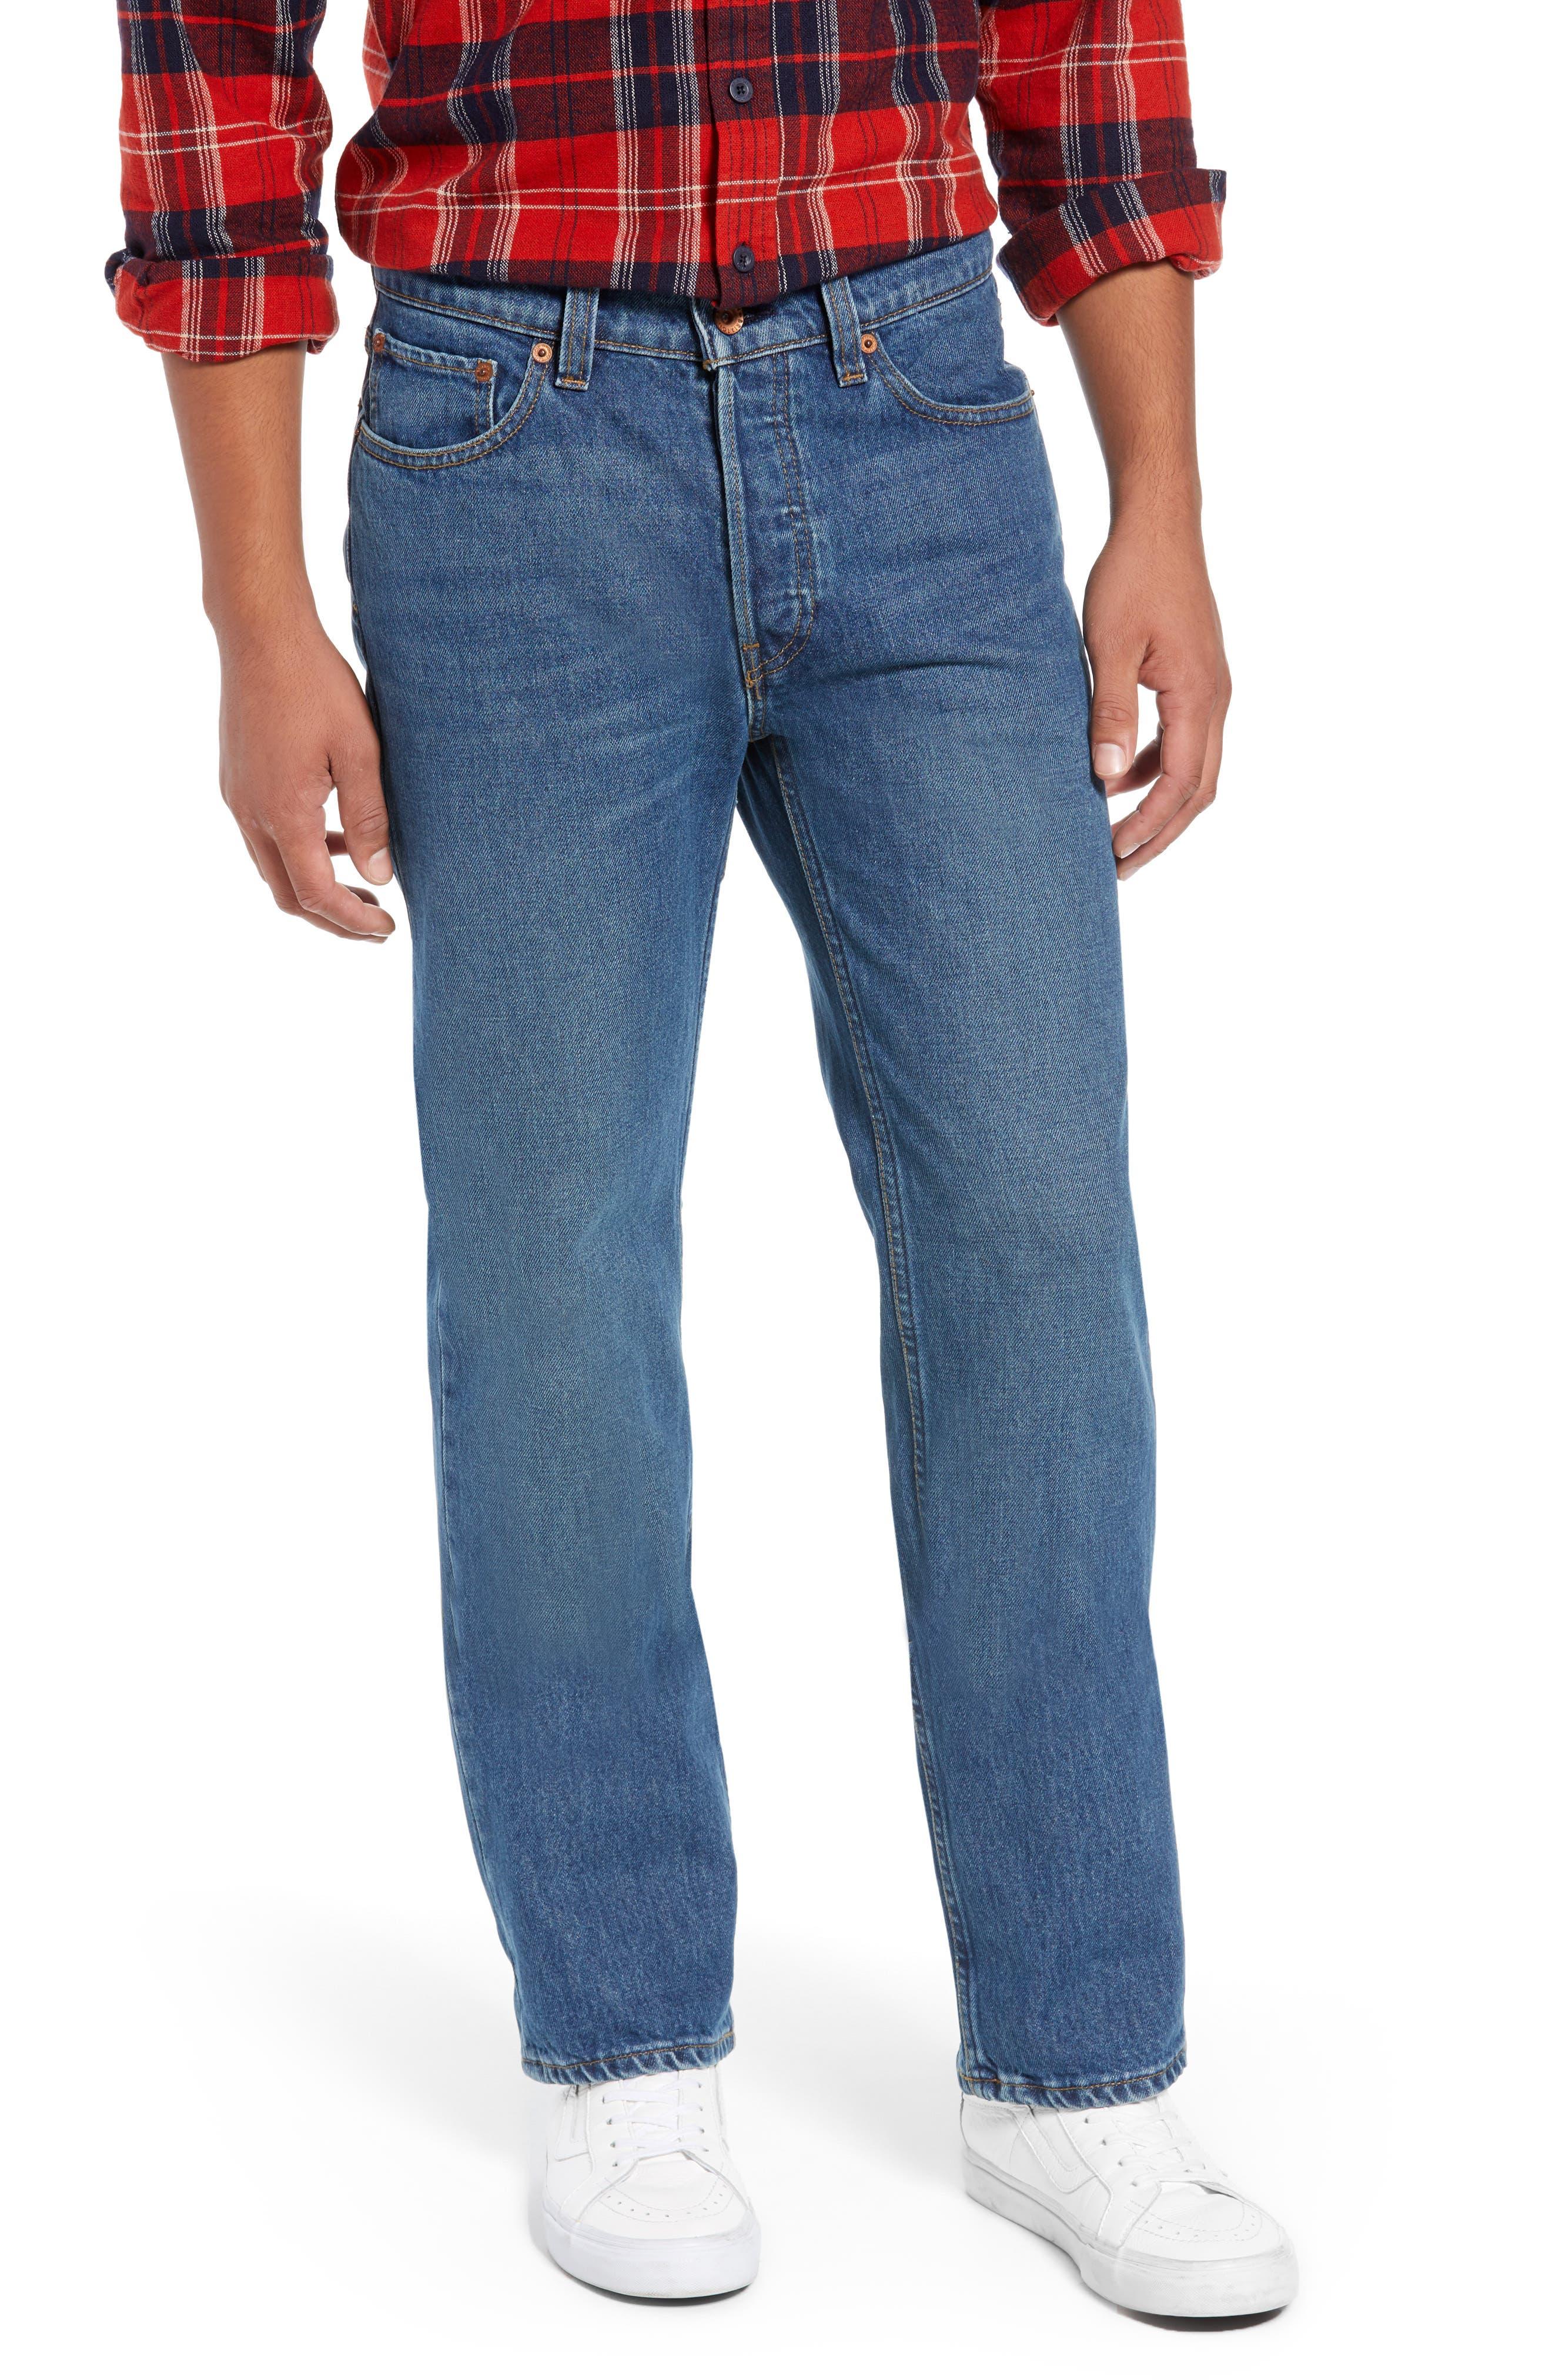 Labor Straight Leg Jeans,                             Main thumbnail 1, color,                             400